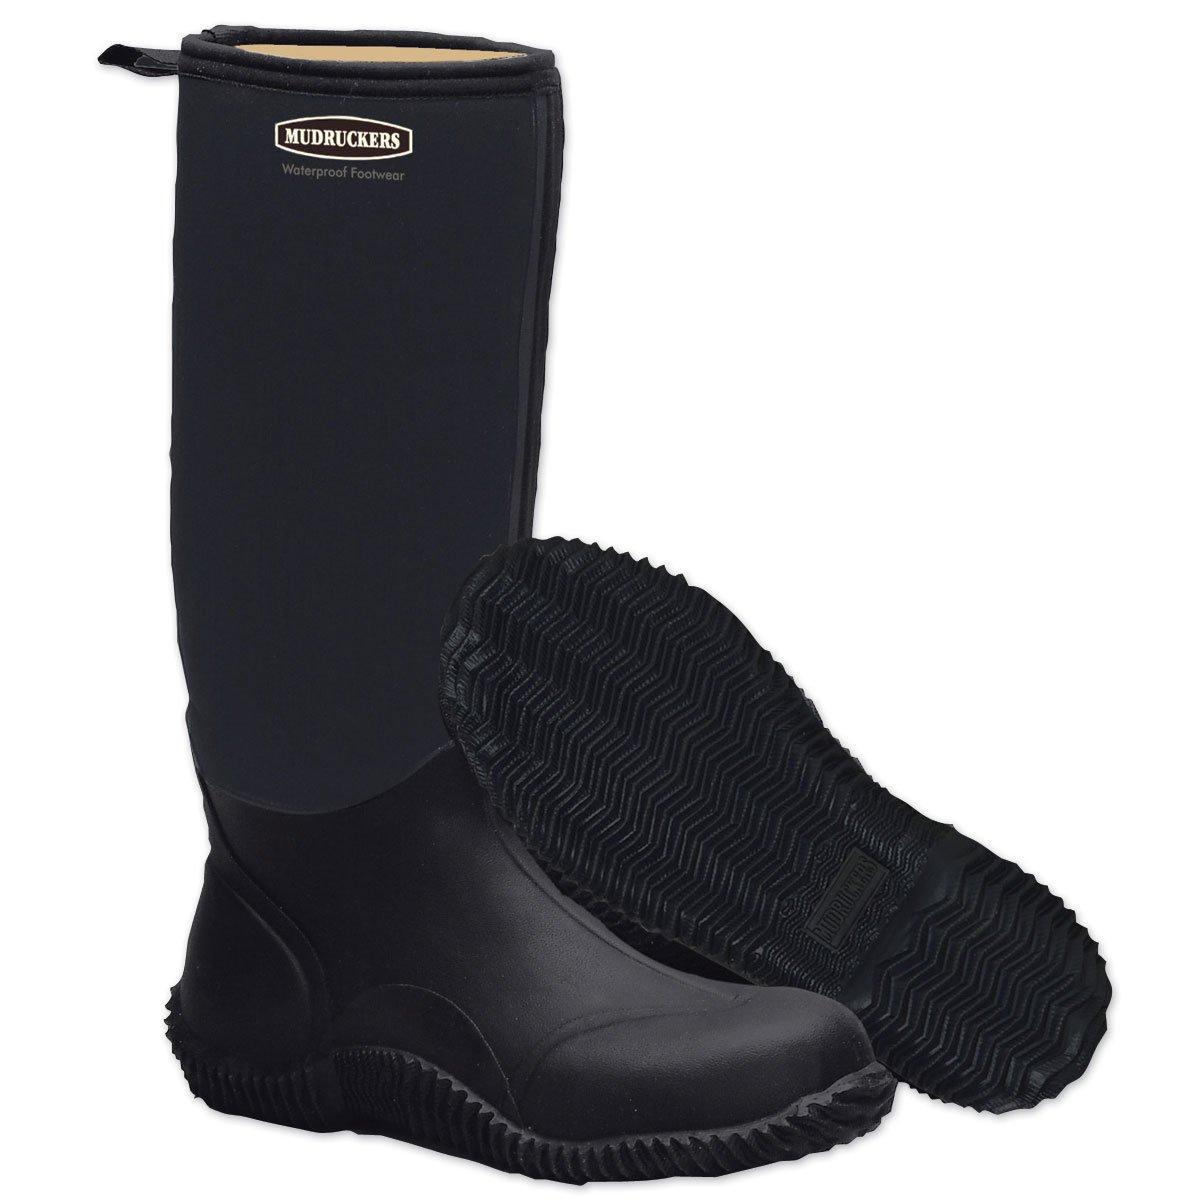 Mudrucker Ladies Tall Boot 5 Black